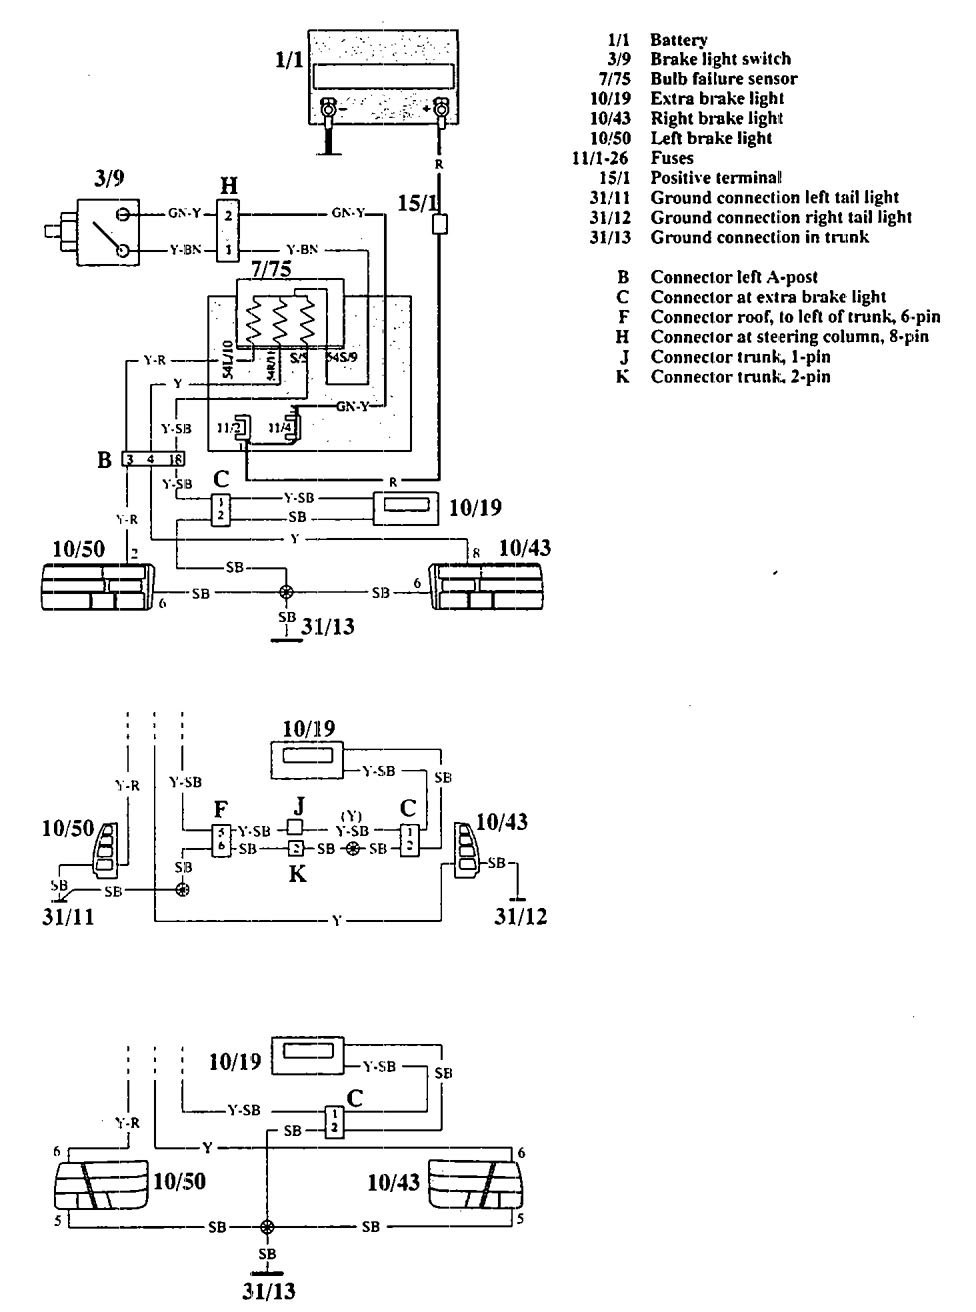 Volvo 740 Stereo Wiring - Wiring Diagram picture slow-printer -  slow-printer.agriturismodisicilia.it | Volvo 740 Stereo Wiring |  | Agriturismo Sicilia